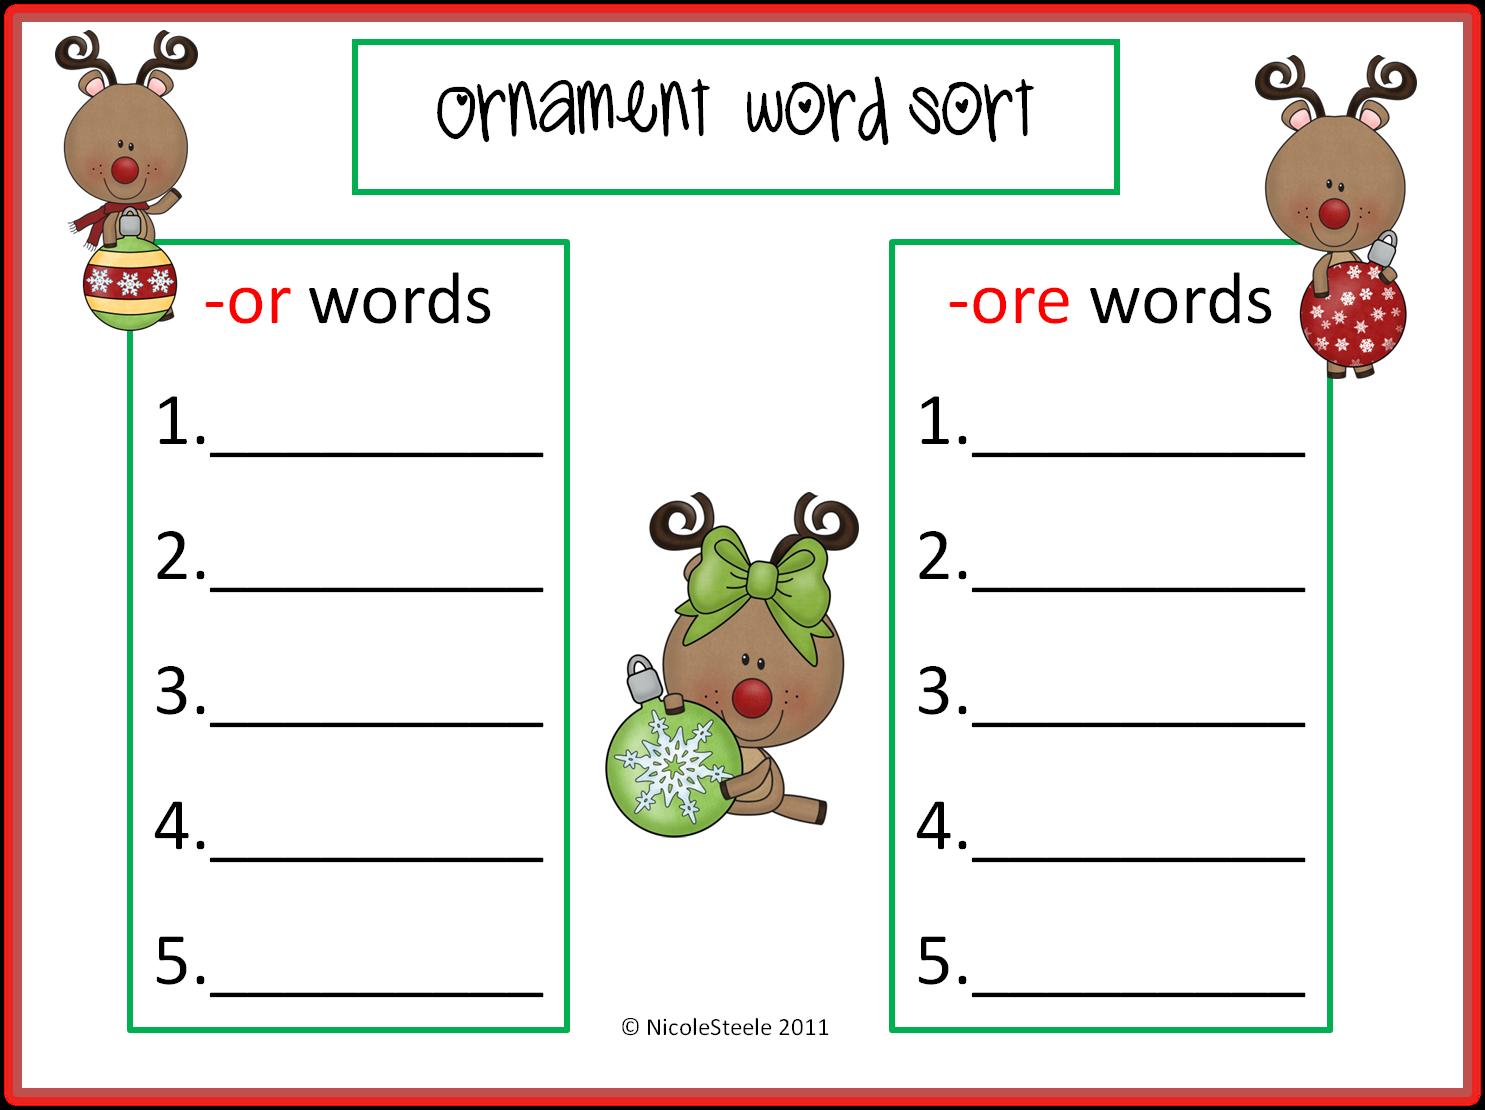 worksheet Sink Or Float Worksheets subject verb agreement worksheet super teacher best resumes learn spanish online at studyspanish sink and float fioradesignstudio